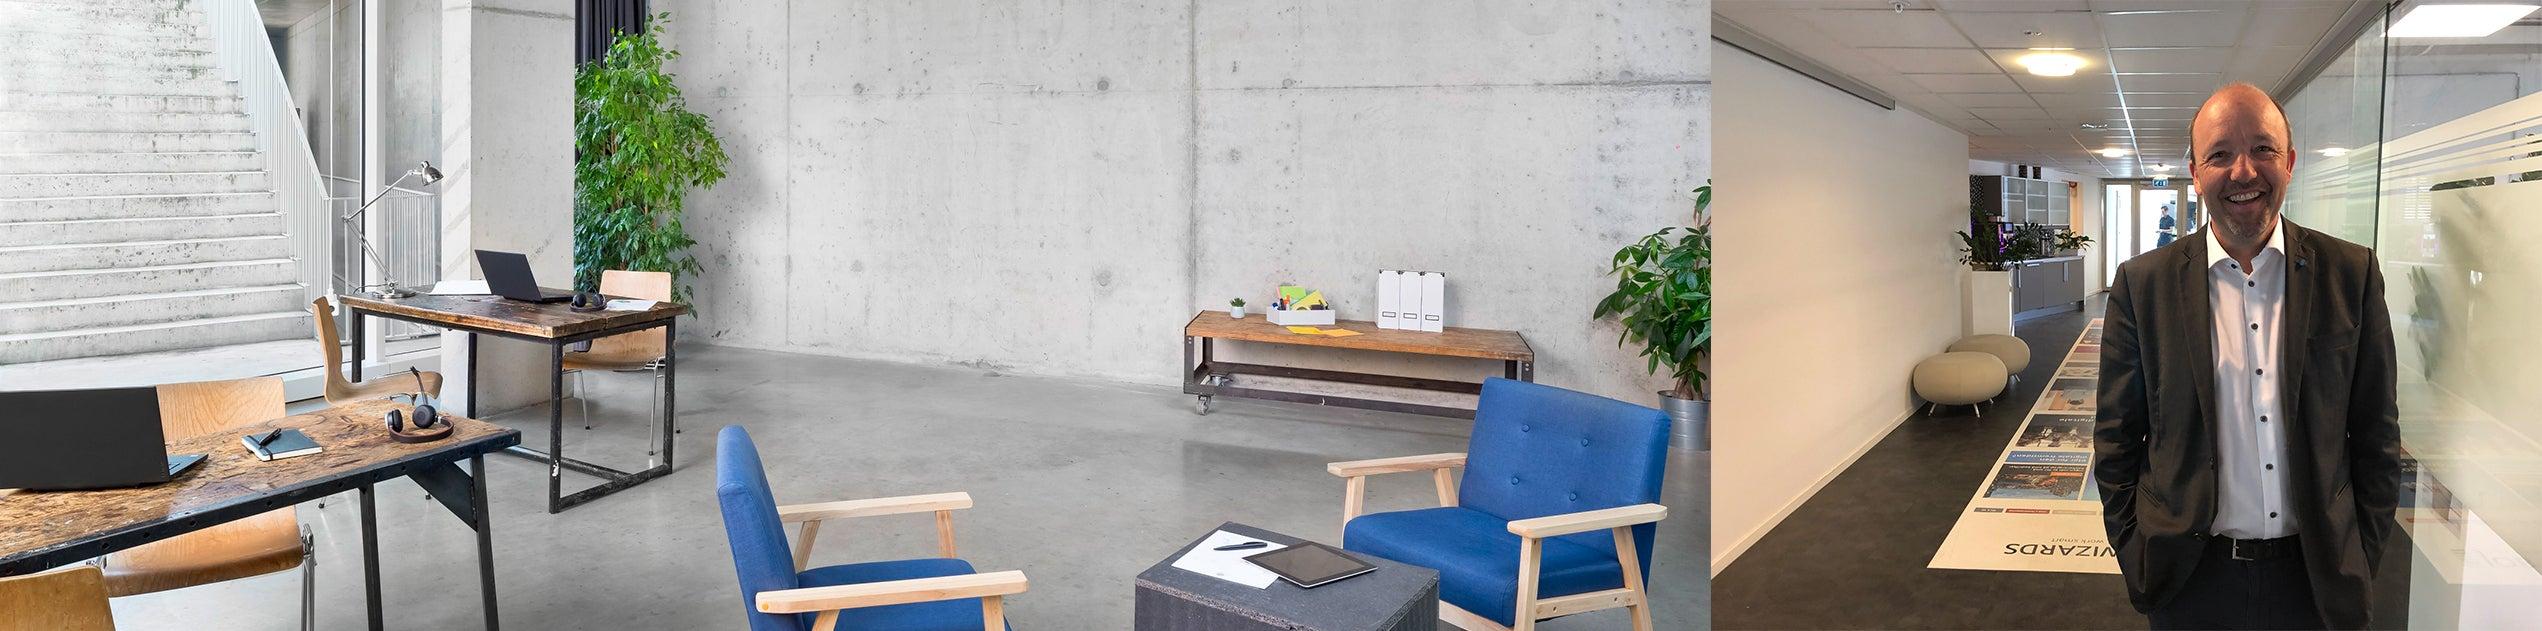 Konica Minolta kjøper Bayonetts skyplattform